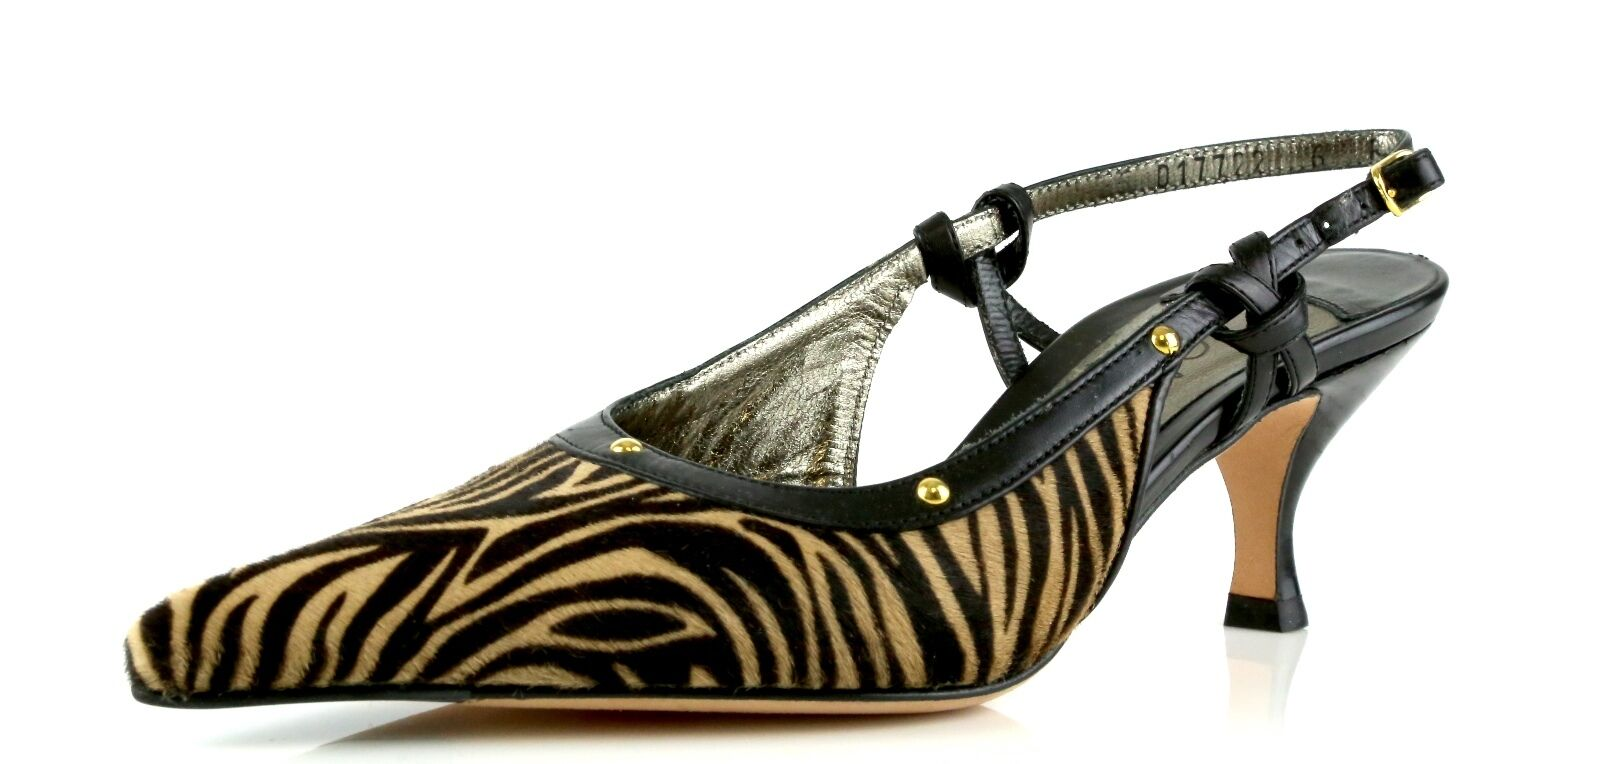 Cole Haan Collection NERINE Zebra Print Slingback Heels 9577 Size 6 B NEW  350